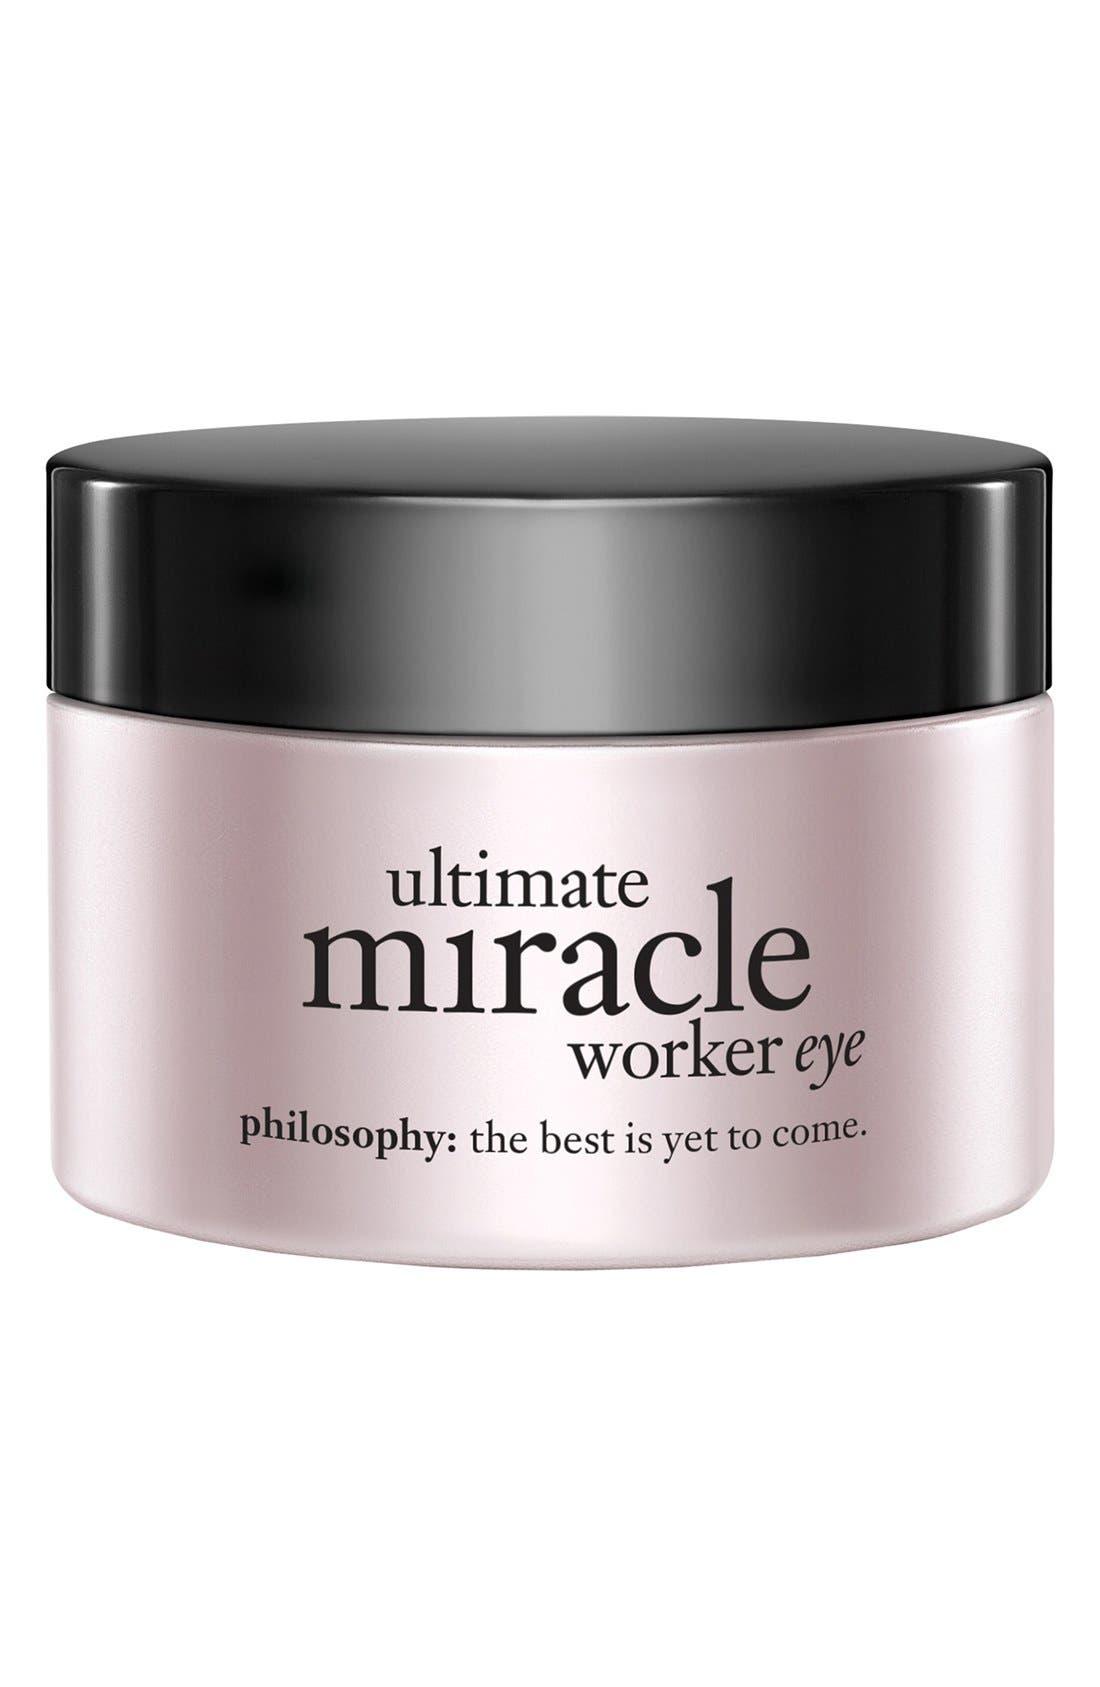 PHILOSOPHY 'ultimate miracle worker eye' multi-rejuvenating eye cream broad spectrum SPF 15, Main, color, NO COLOR